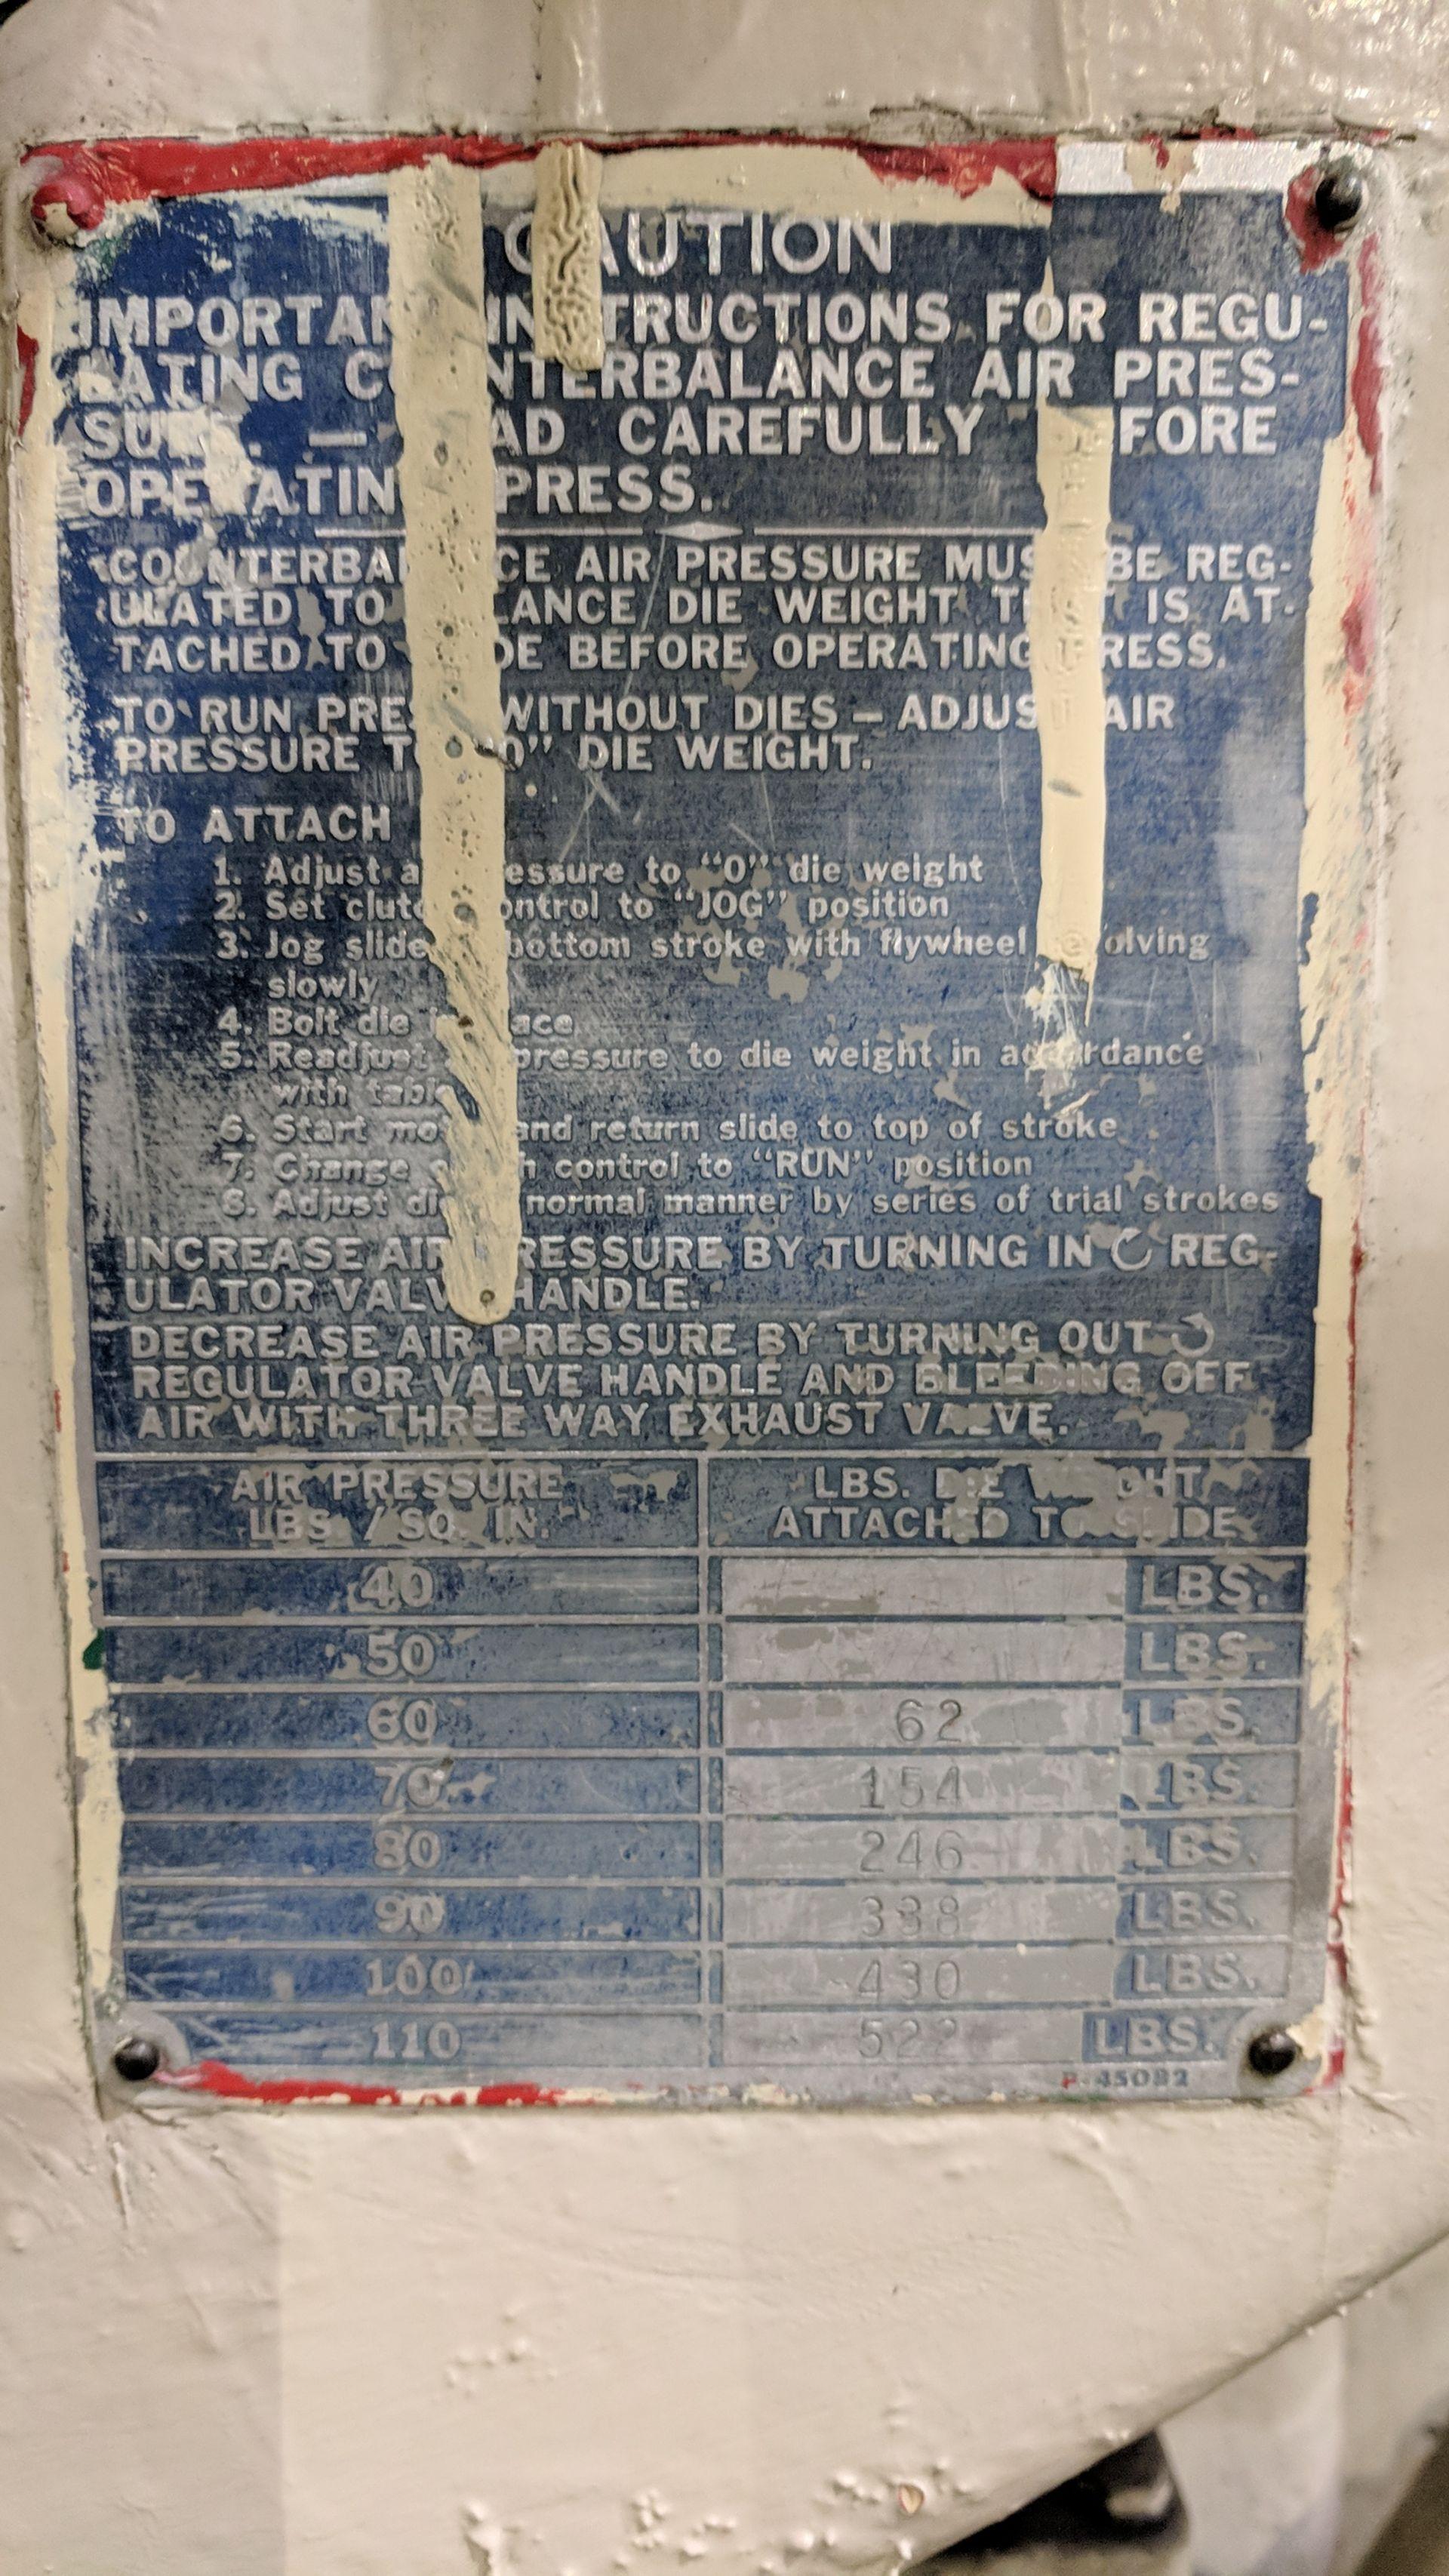 "Lot 2 - NIAGARA A 3-1/2 45 TON CAPACITY OBI PUNCH PRESS WITH 36""X24"" BED, 18""X16"" RAM, 16"" SHUT HEIGHT, 6"""